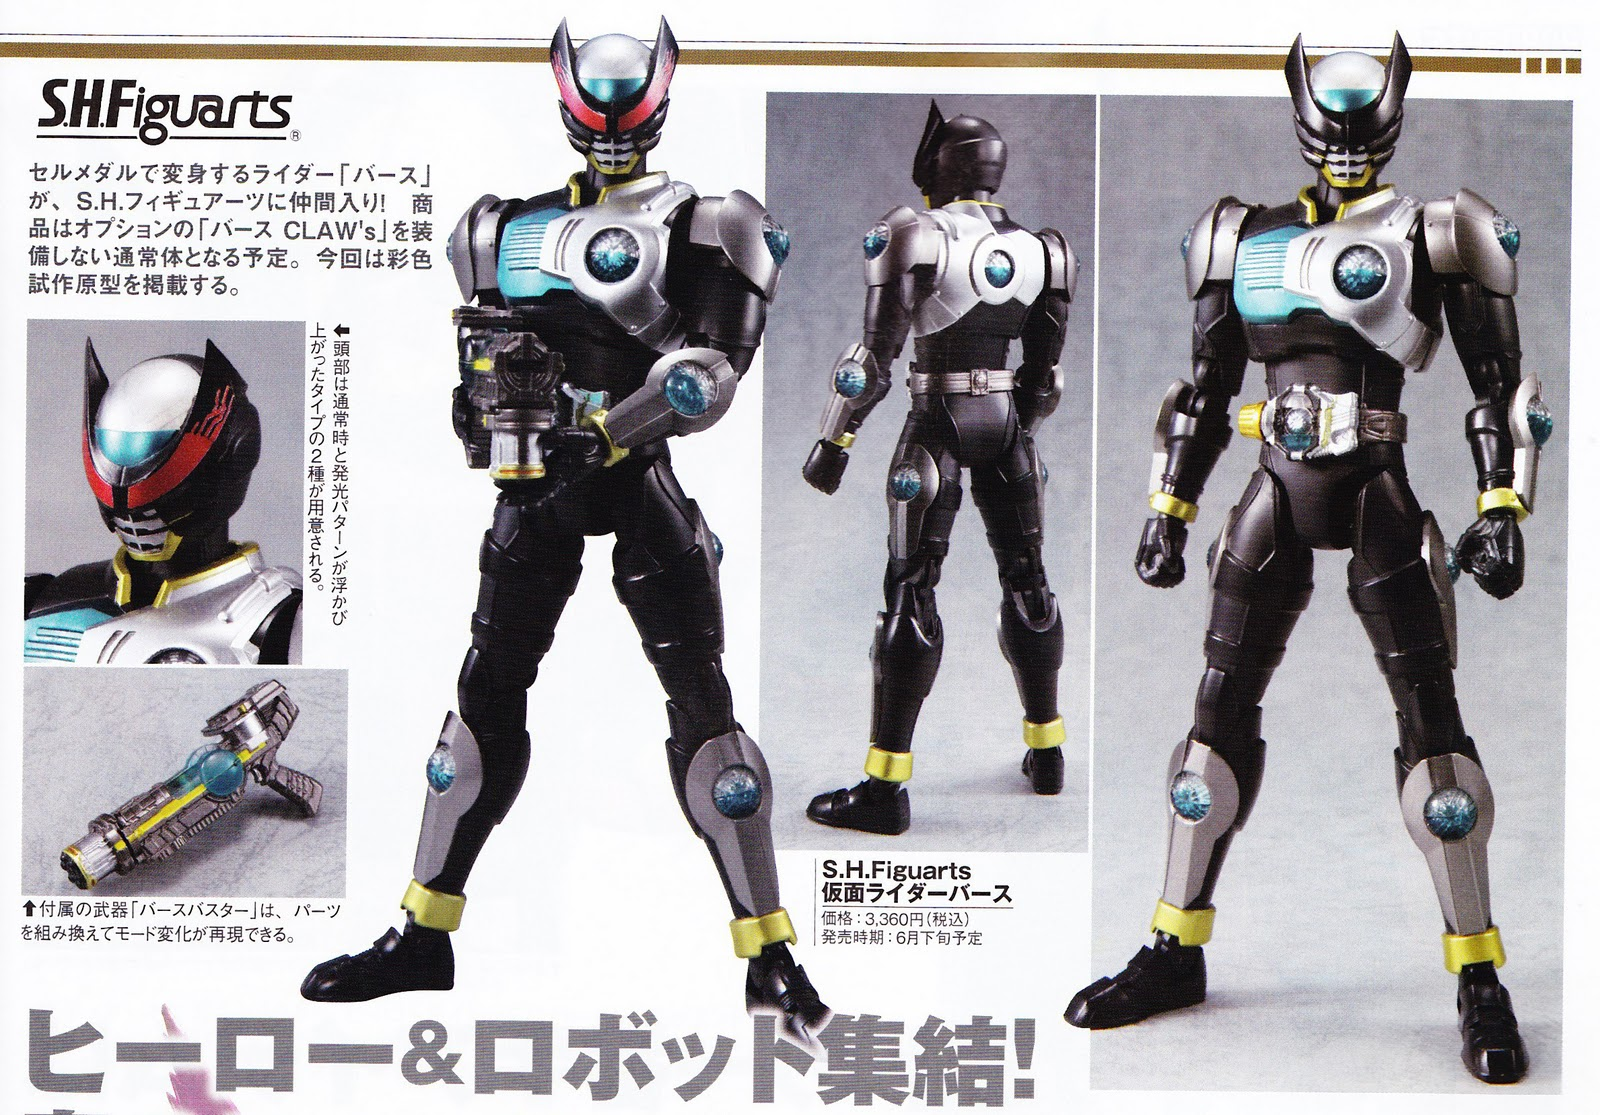 GG FIGURE NEWS: S H Figuarts Kamen Rider Birth - Hobby Magazine (Apr